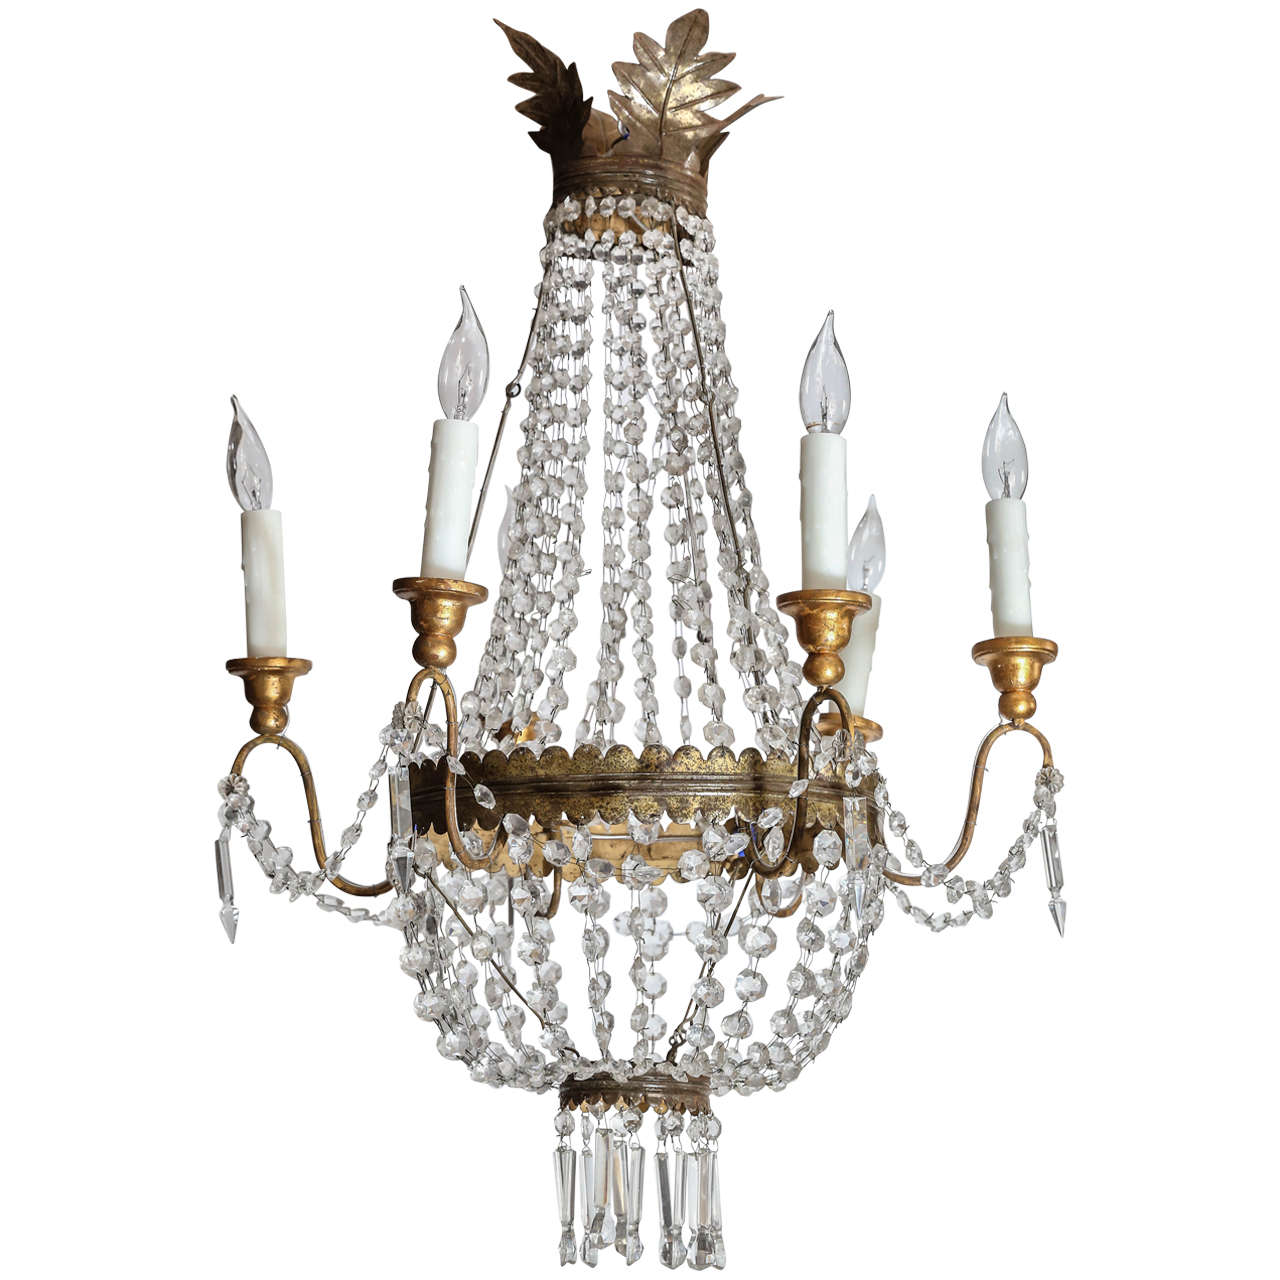 Italian vintage metal and wood crystal chandelier with six arms for italian vintage metal and wood crystal chandelier with six arms for sale arubaitofo Choice Image